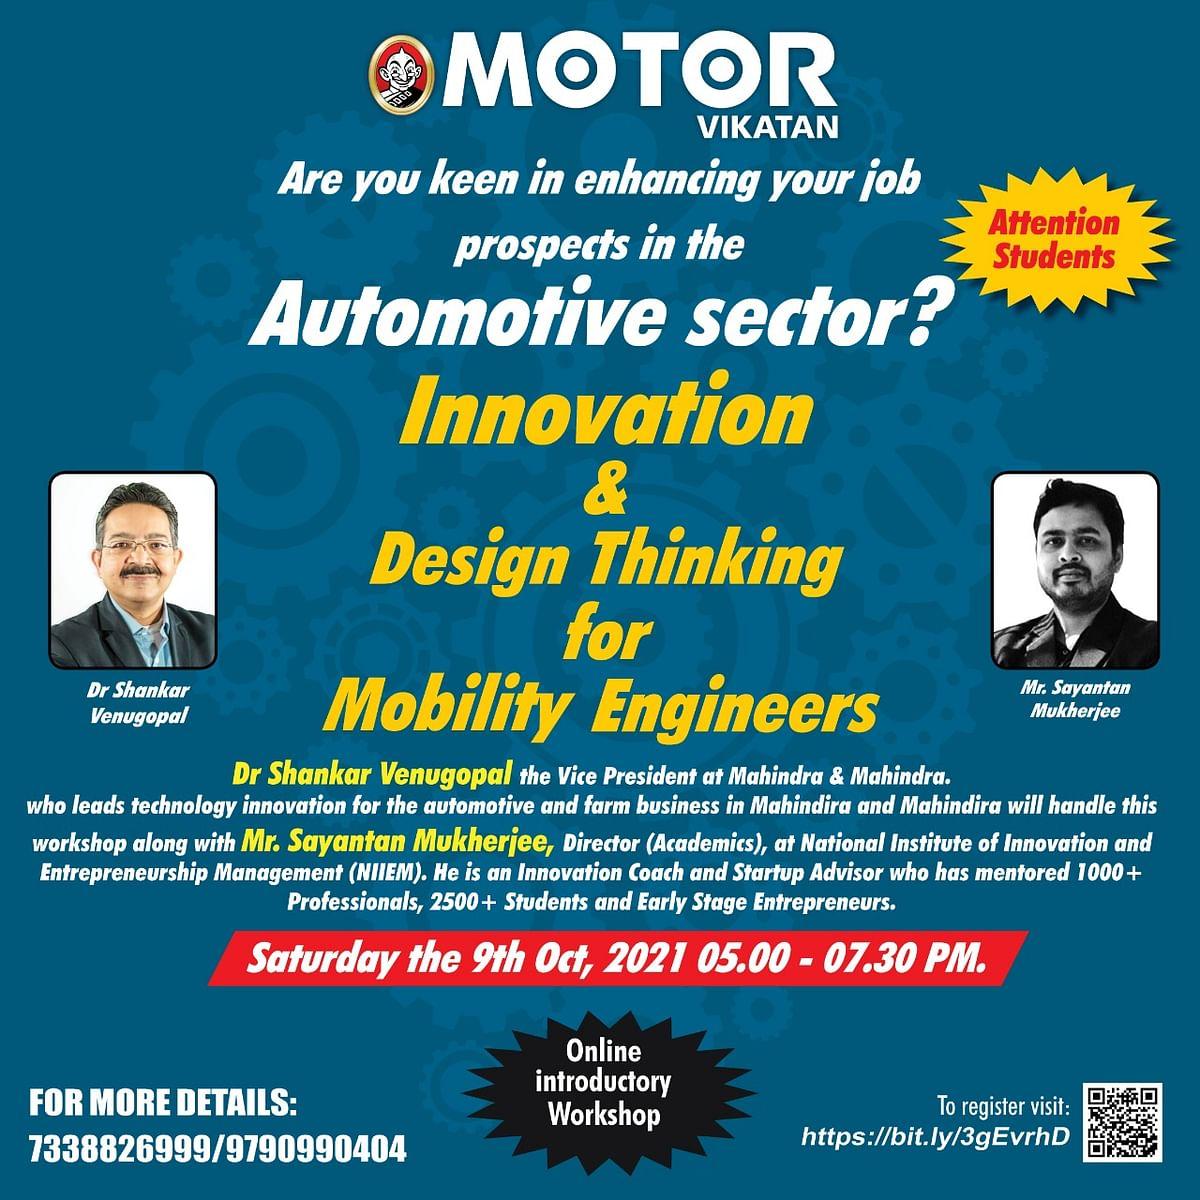 Workshop to enhance Job Prospects by Mr Sayantan Mukherjee and Dr Shankar Venugopal